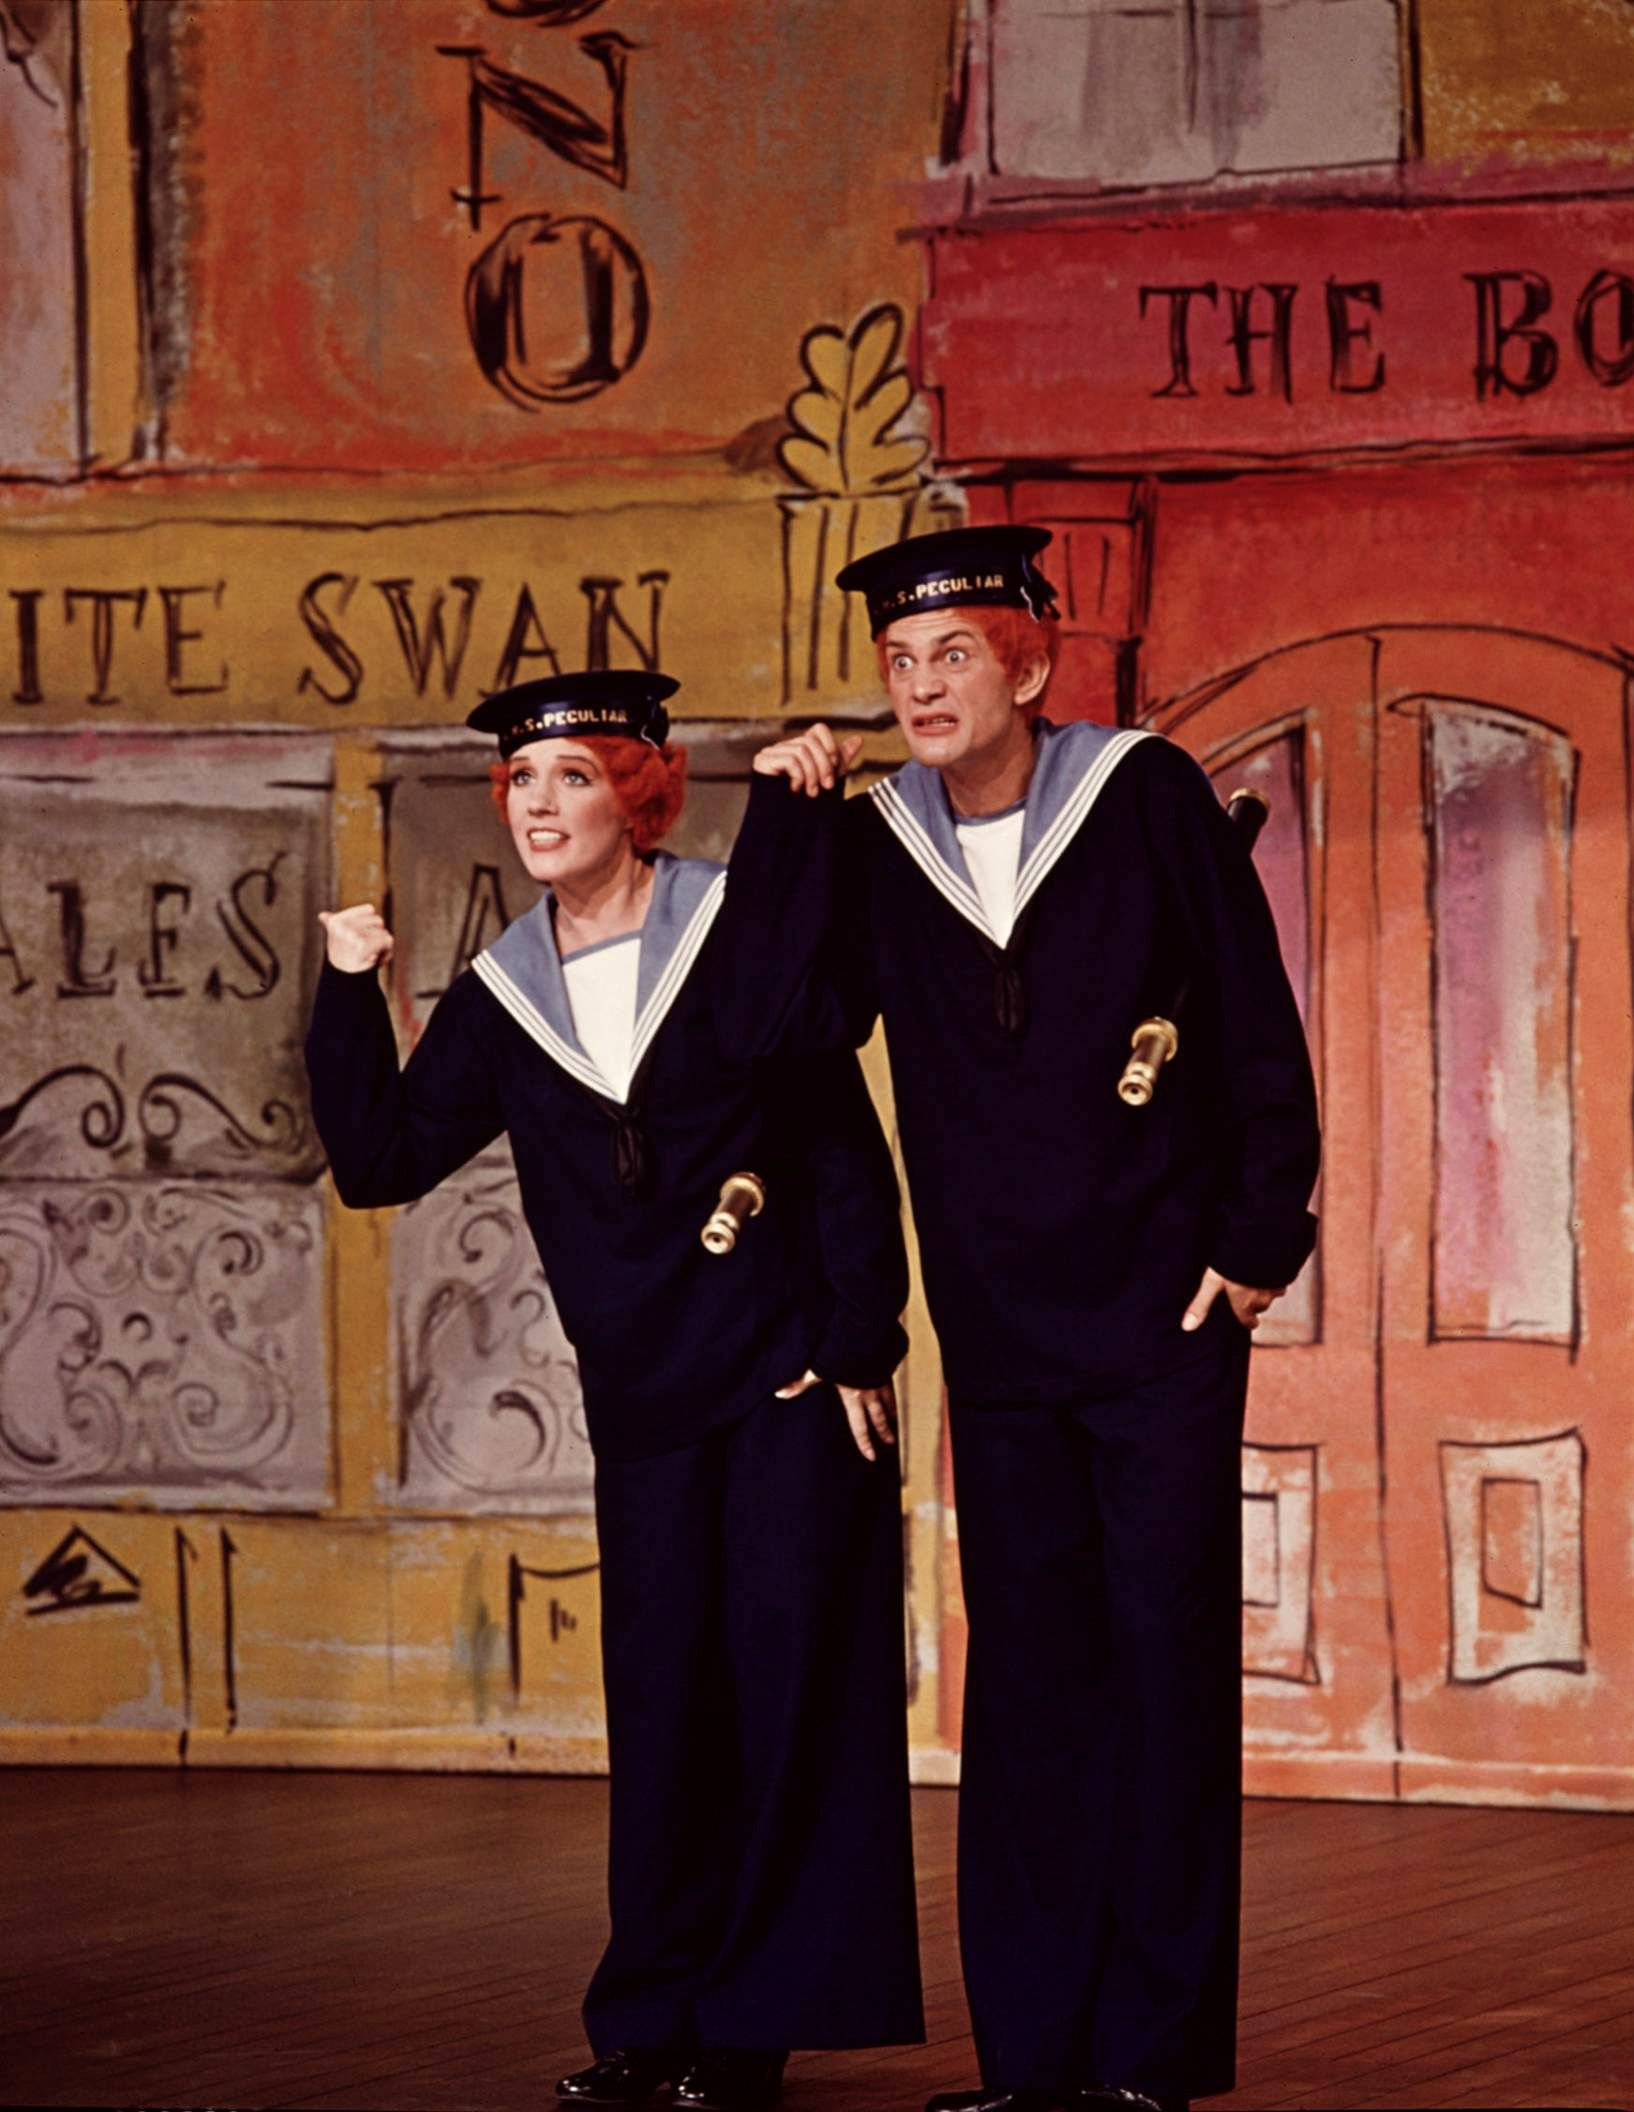 Julie Andrews with Daniel Massey